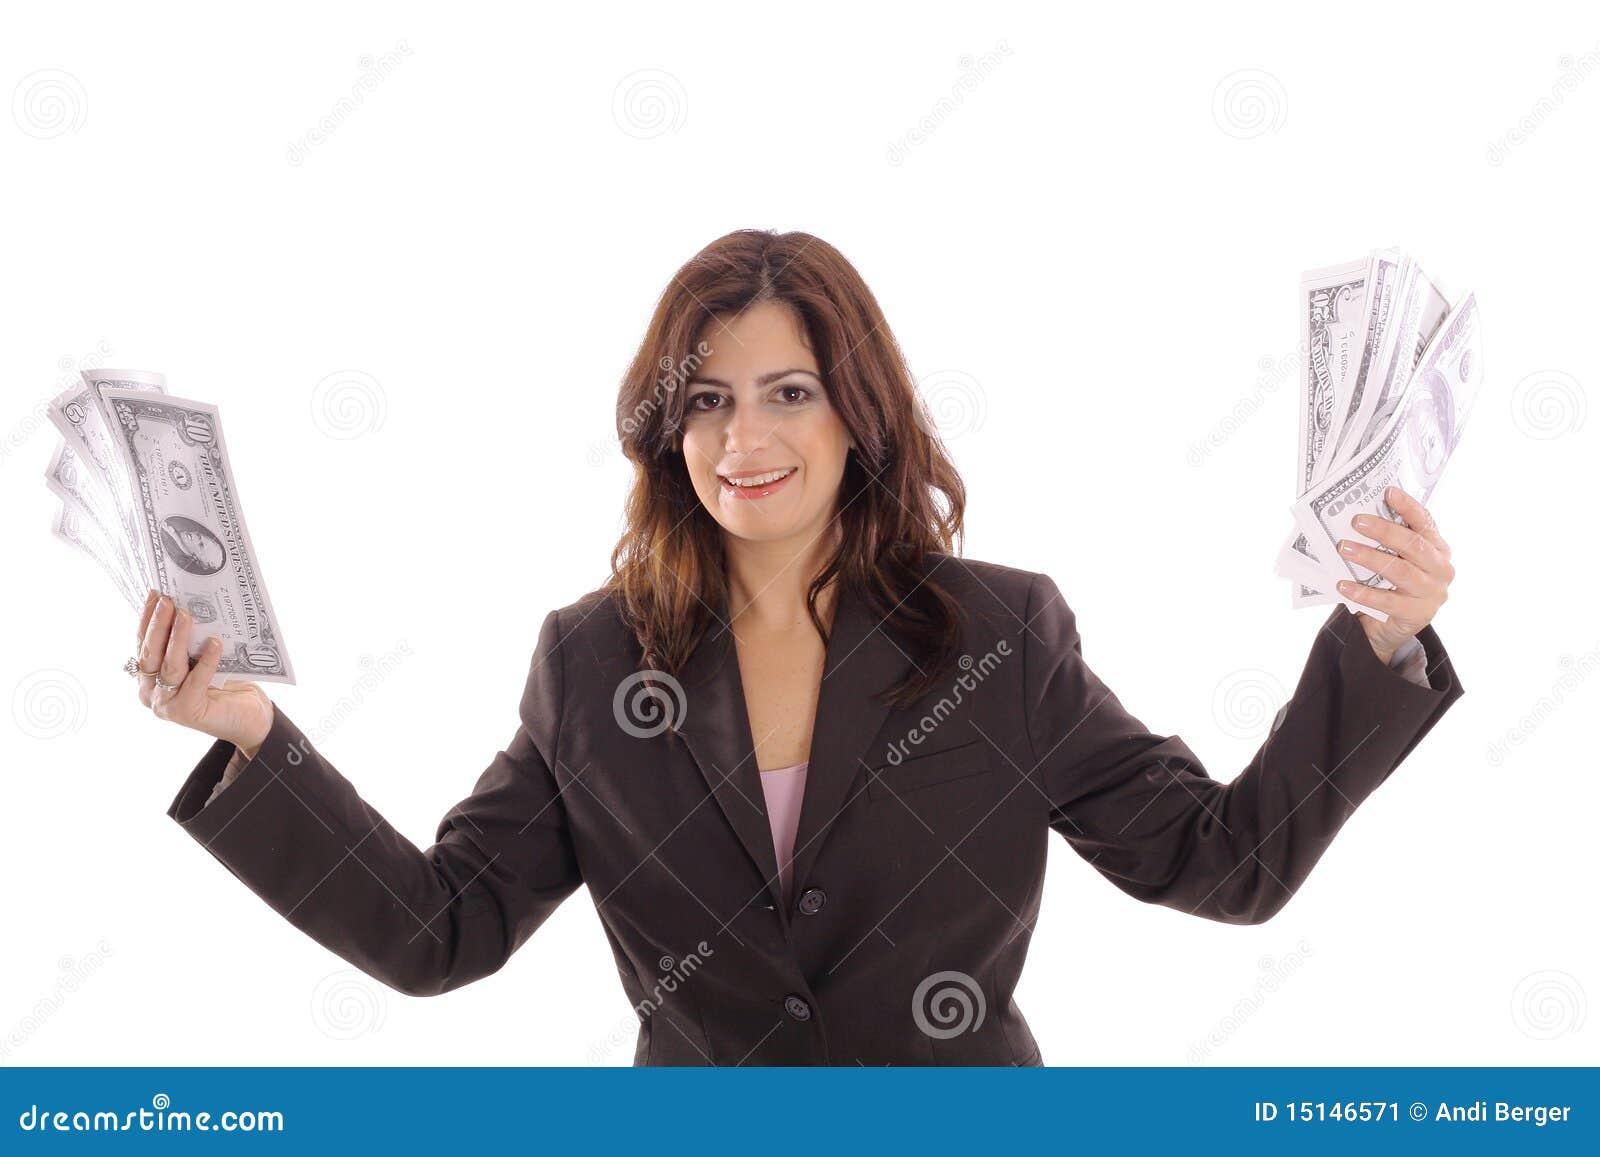 Happy Woman Holding Money Stock Image - Image: 15146571